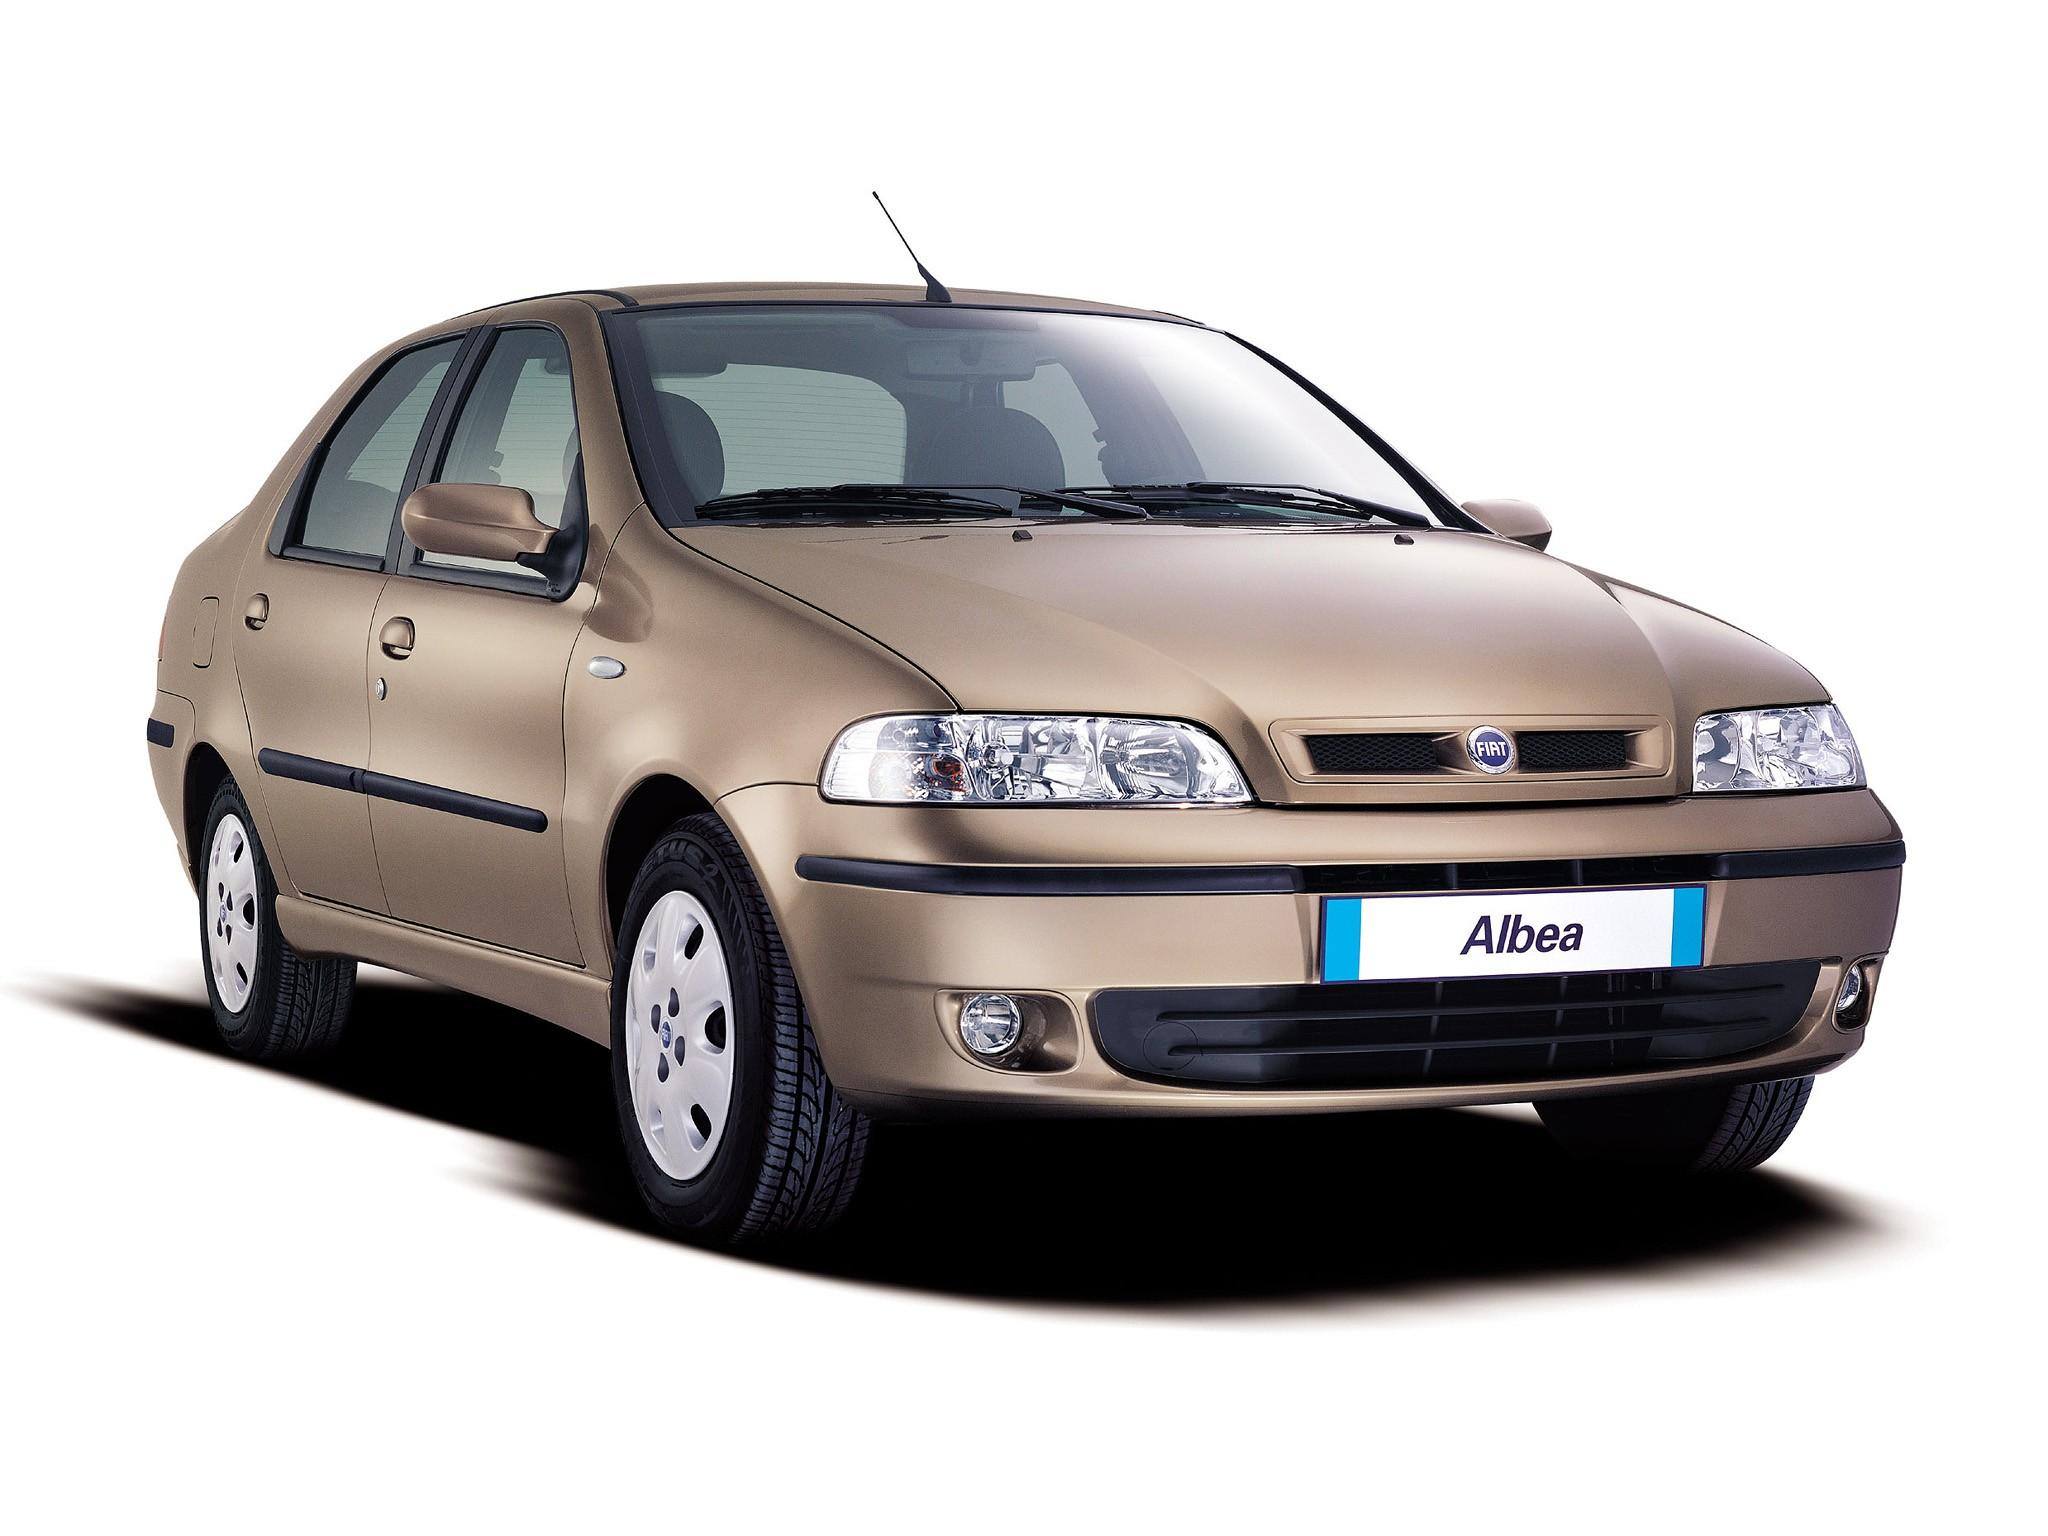 Fiat Albea Siena Specs Amp Photos 2002 2003 2004 2005